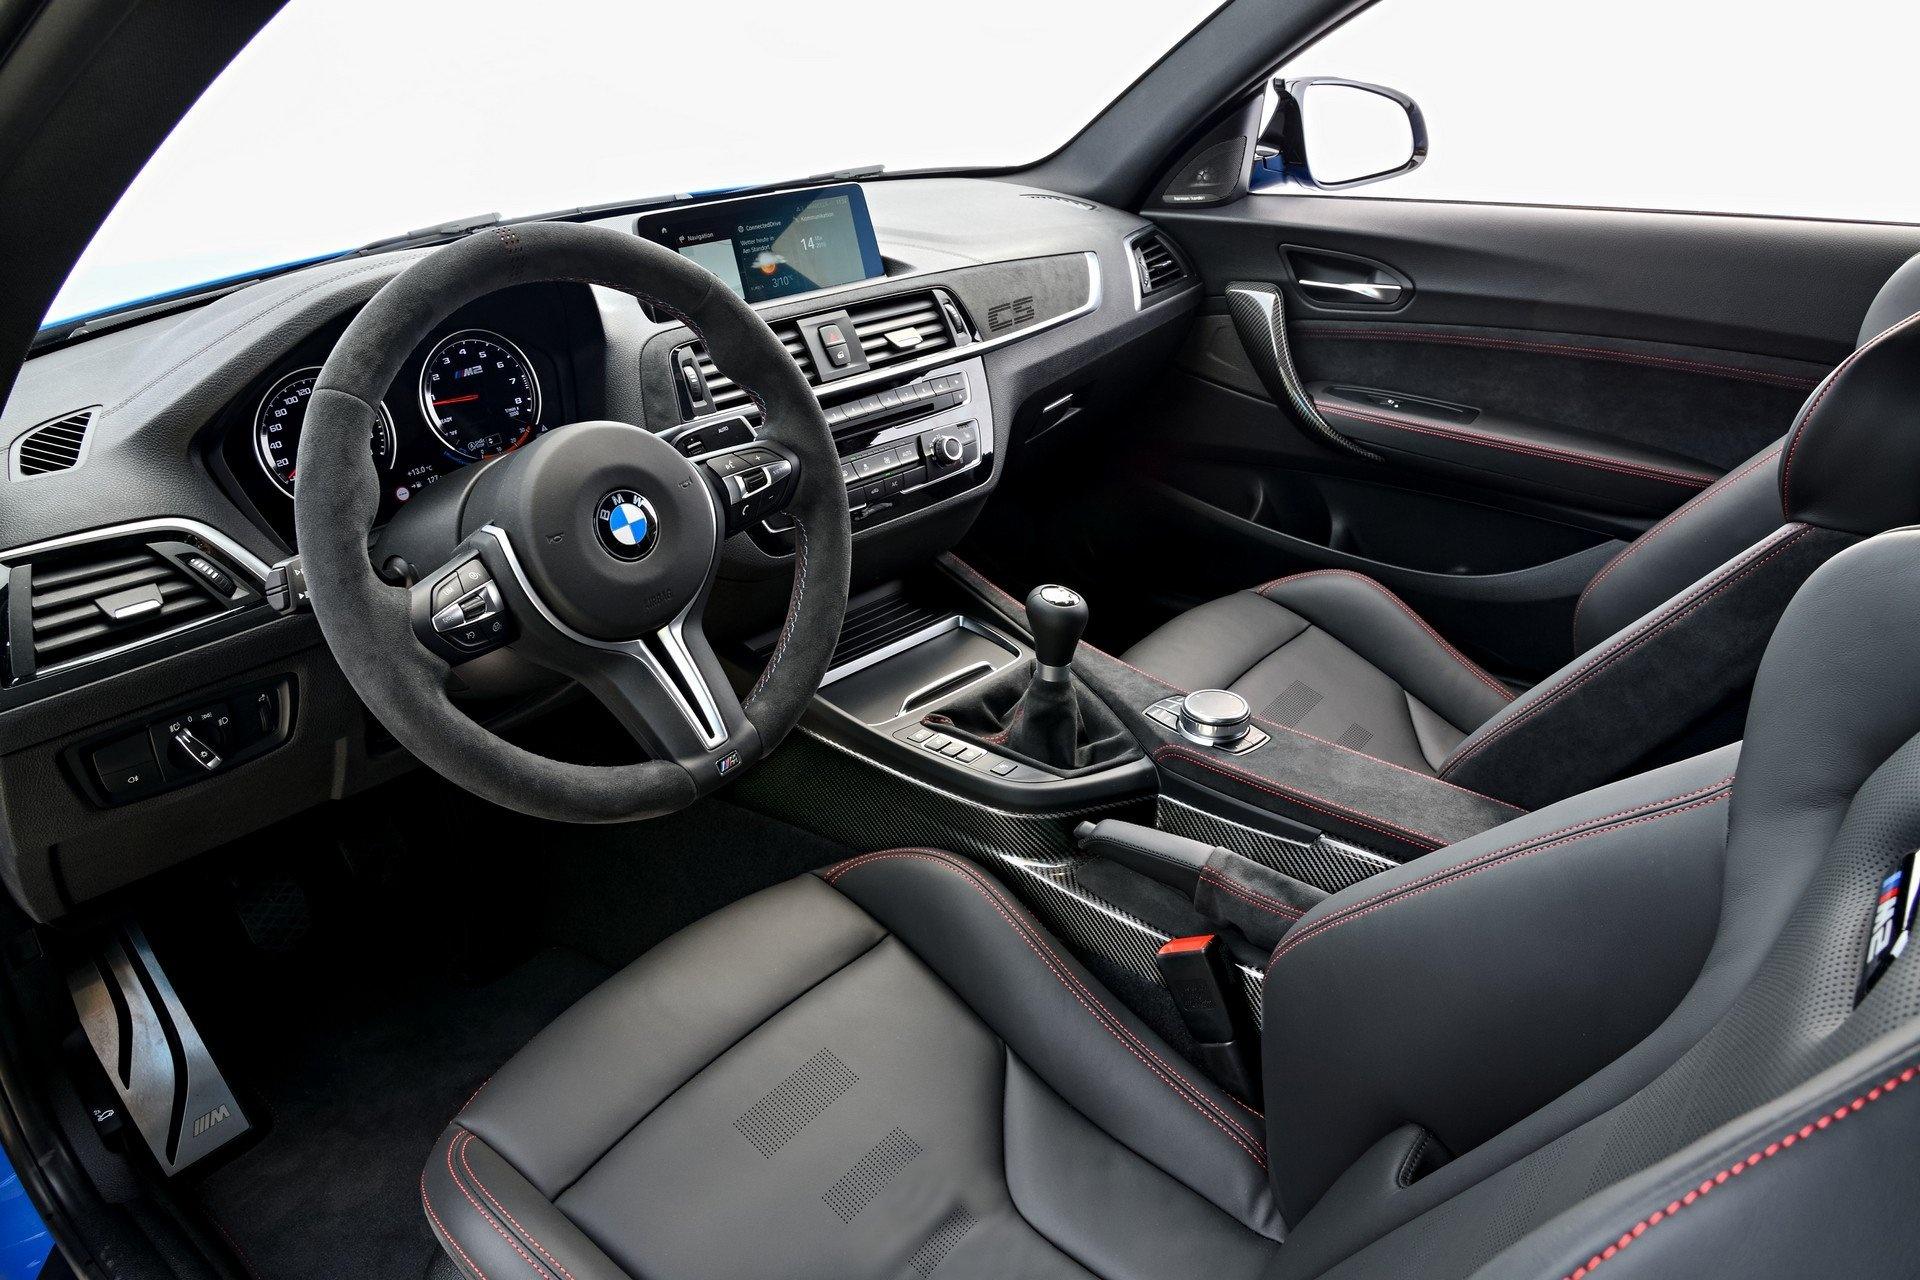 Chiem nguong BMW M2 C2 2020 anh 23